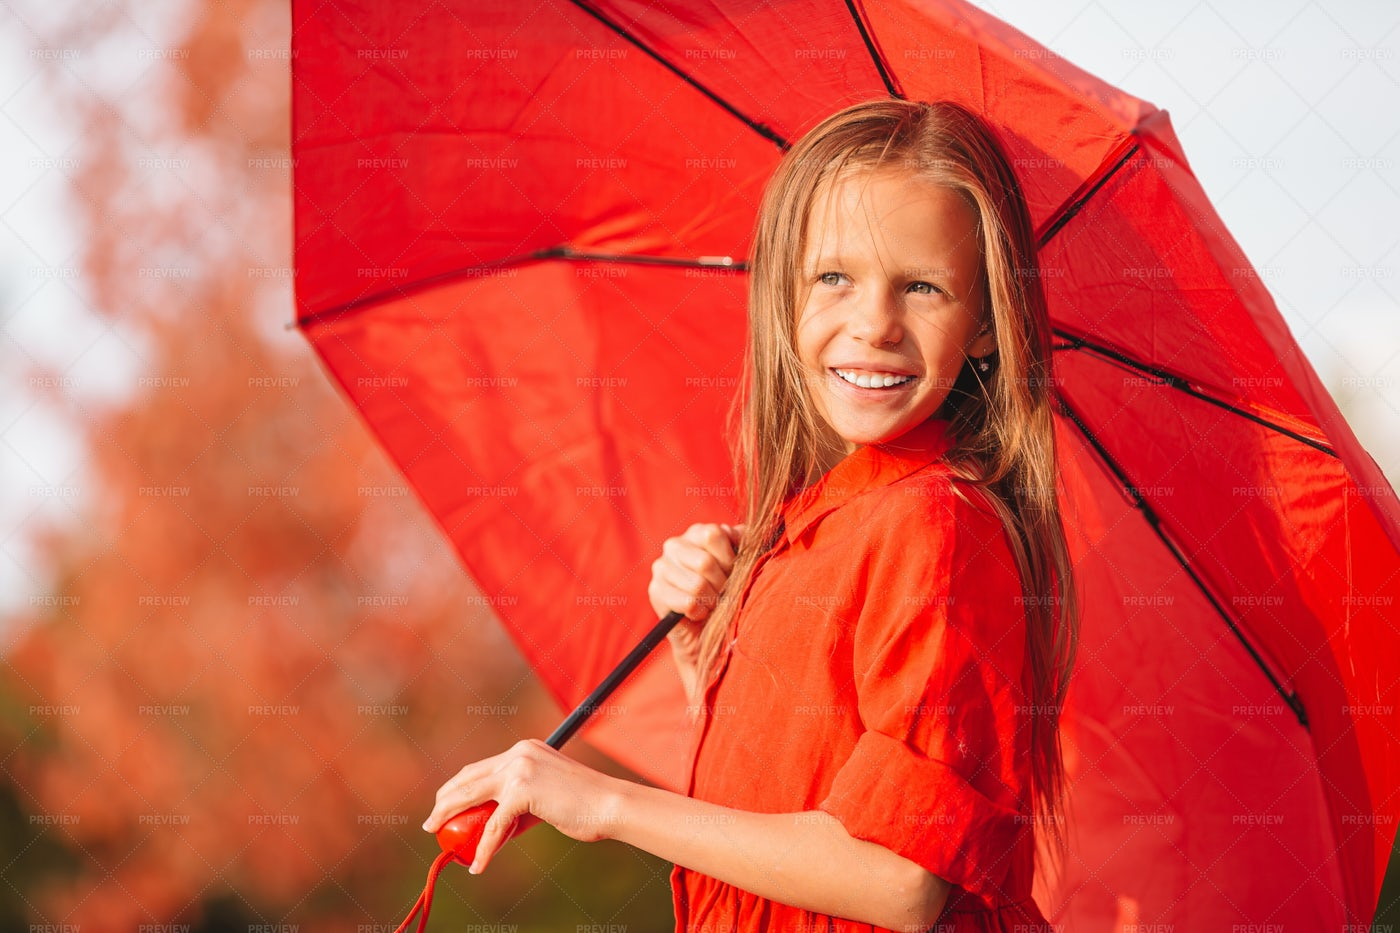 Red Umbrella On Shoulder: Stock Photos